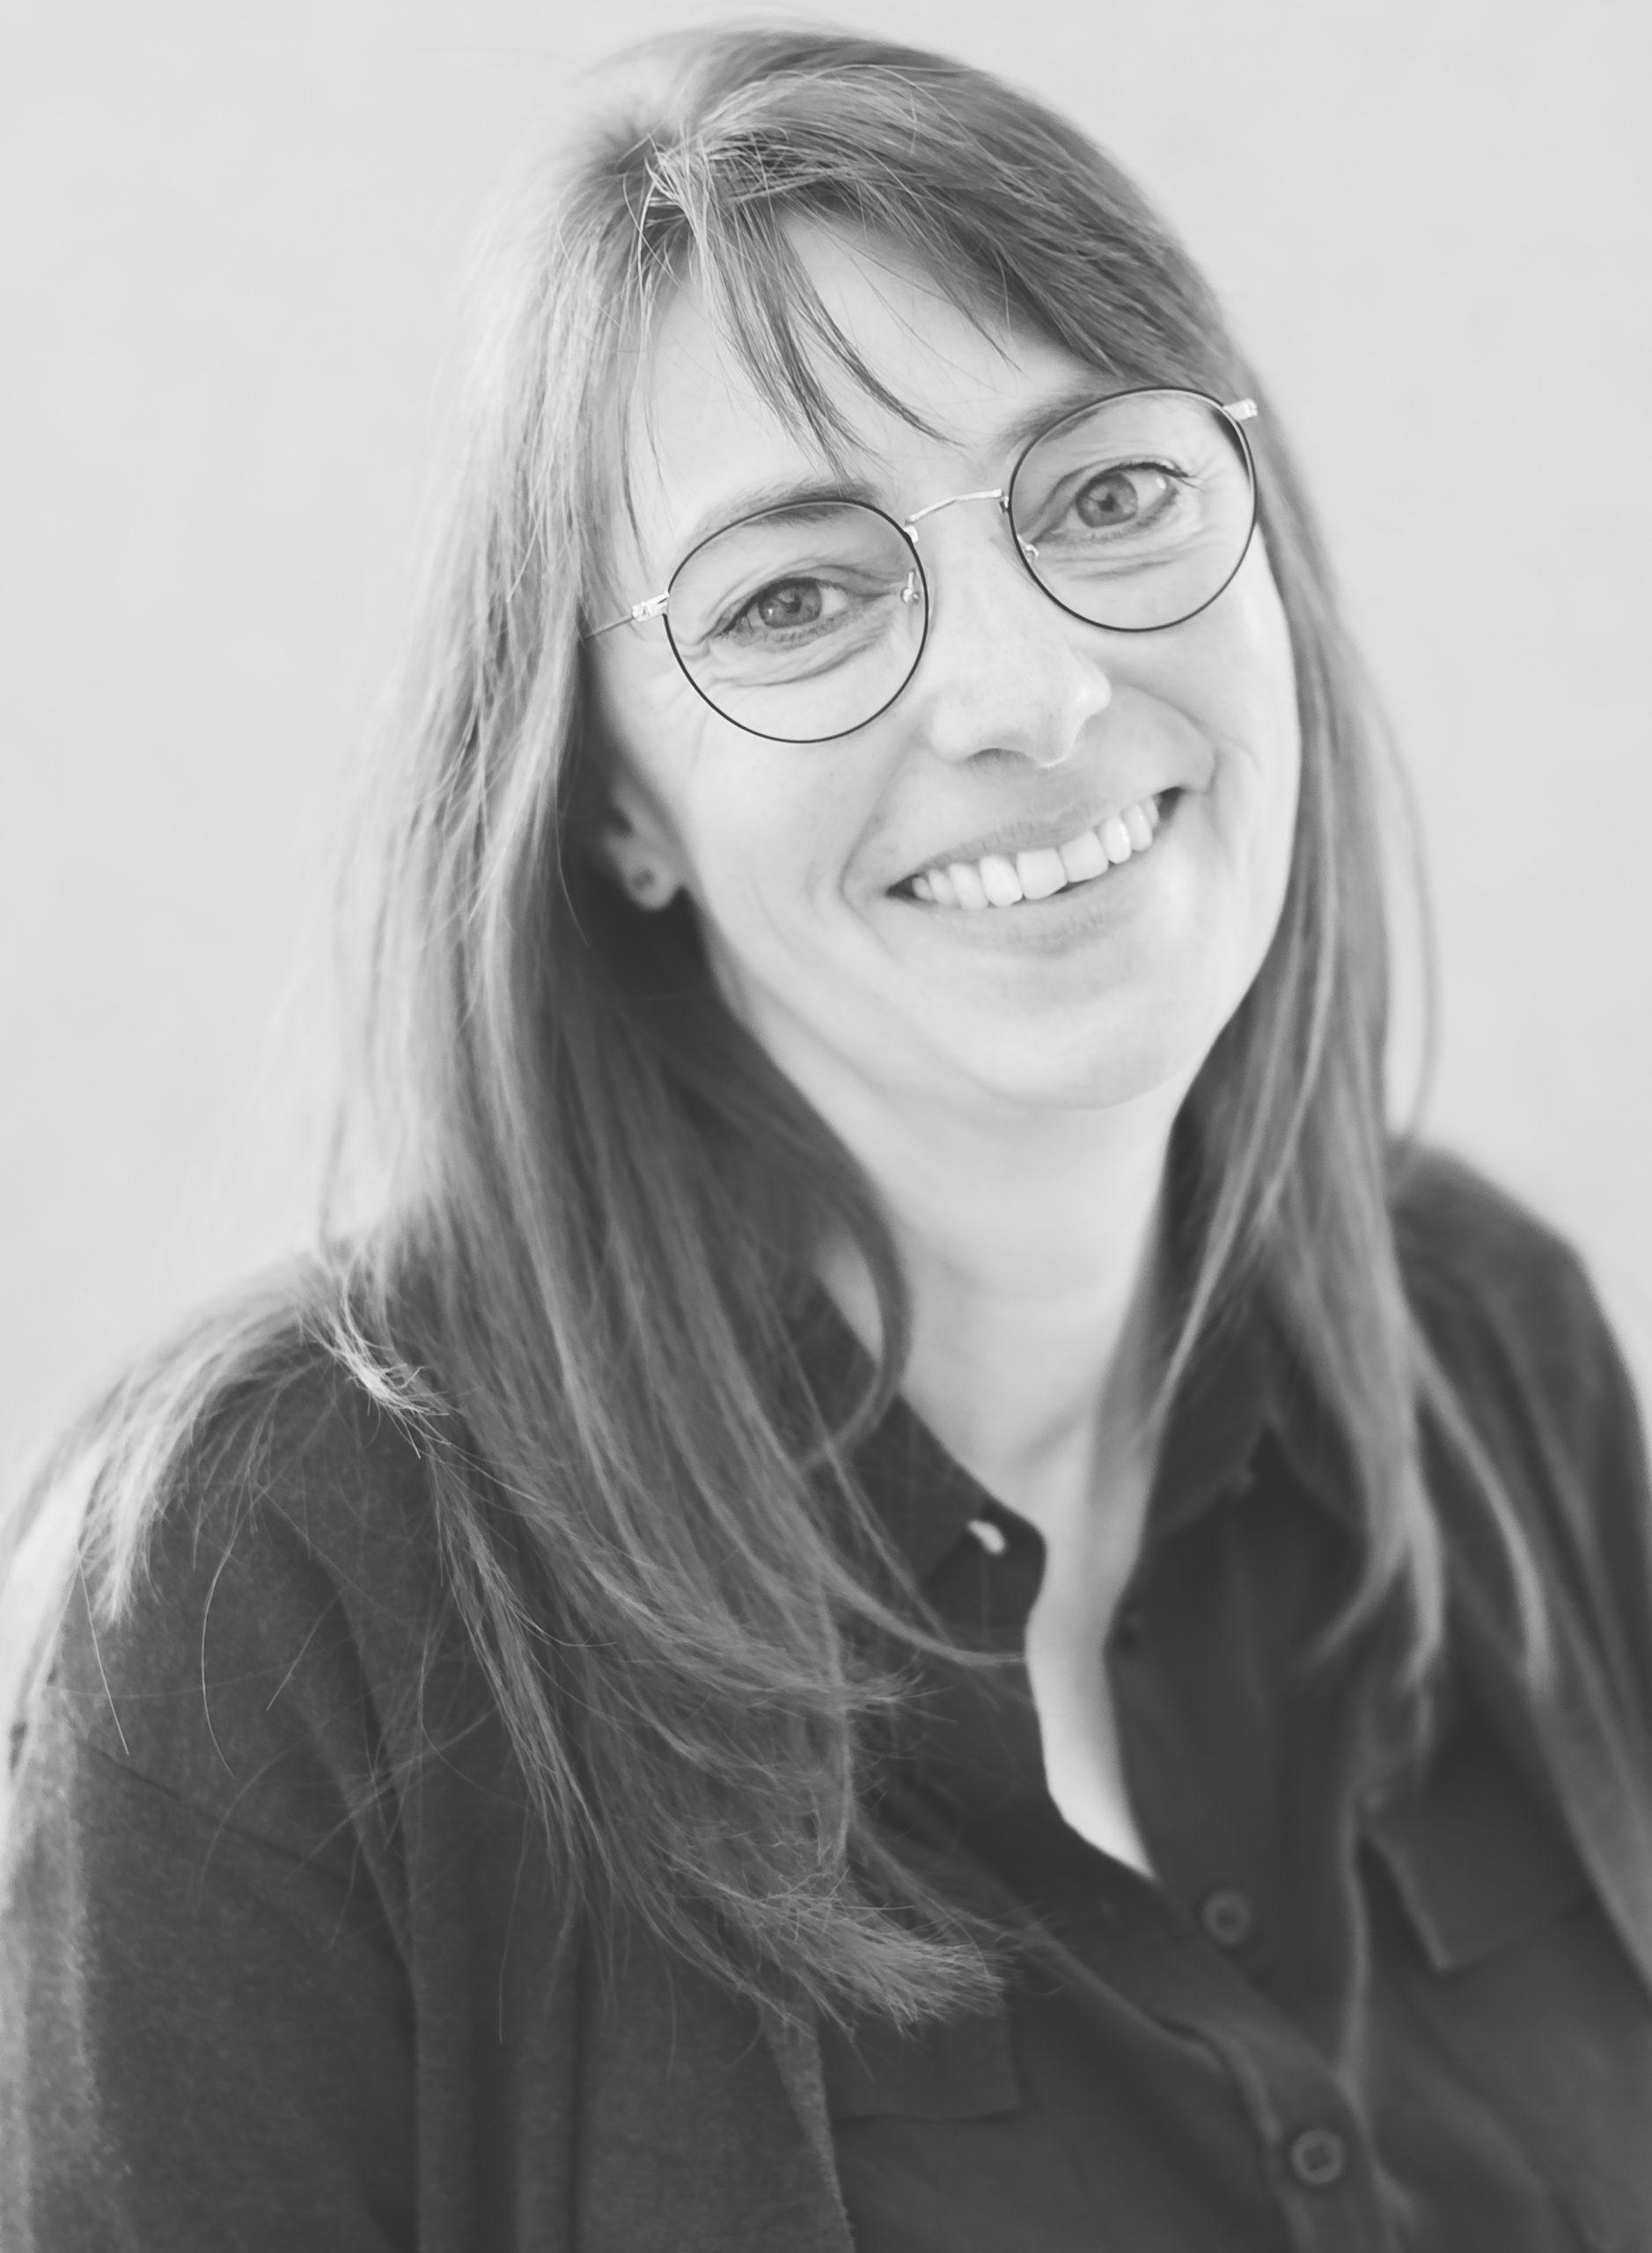 Andrea Bezner